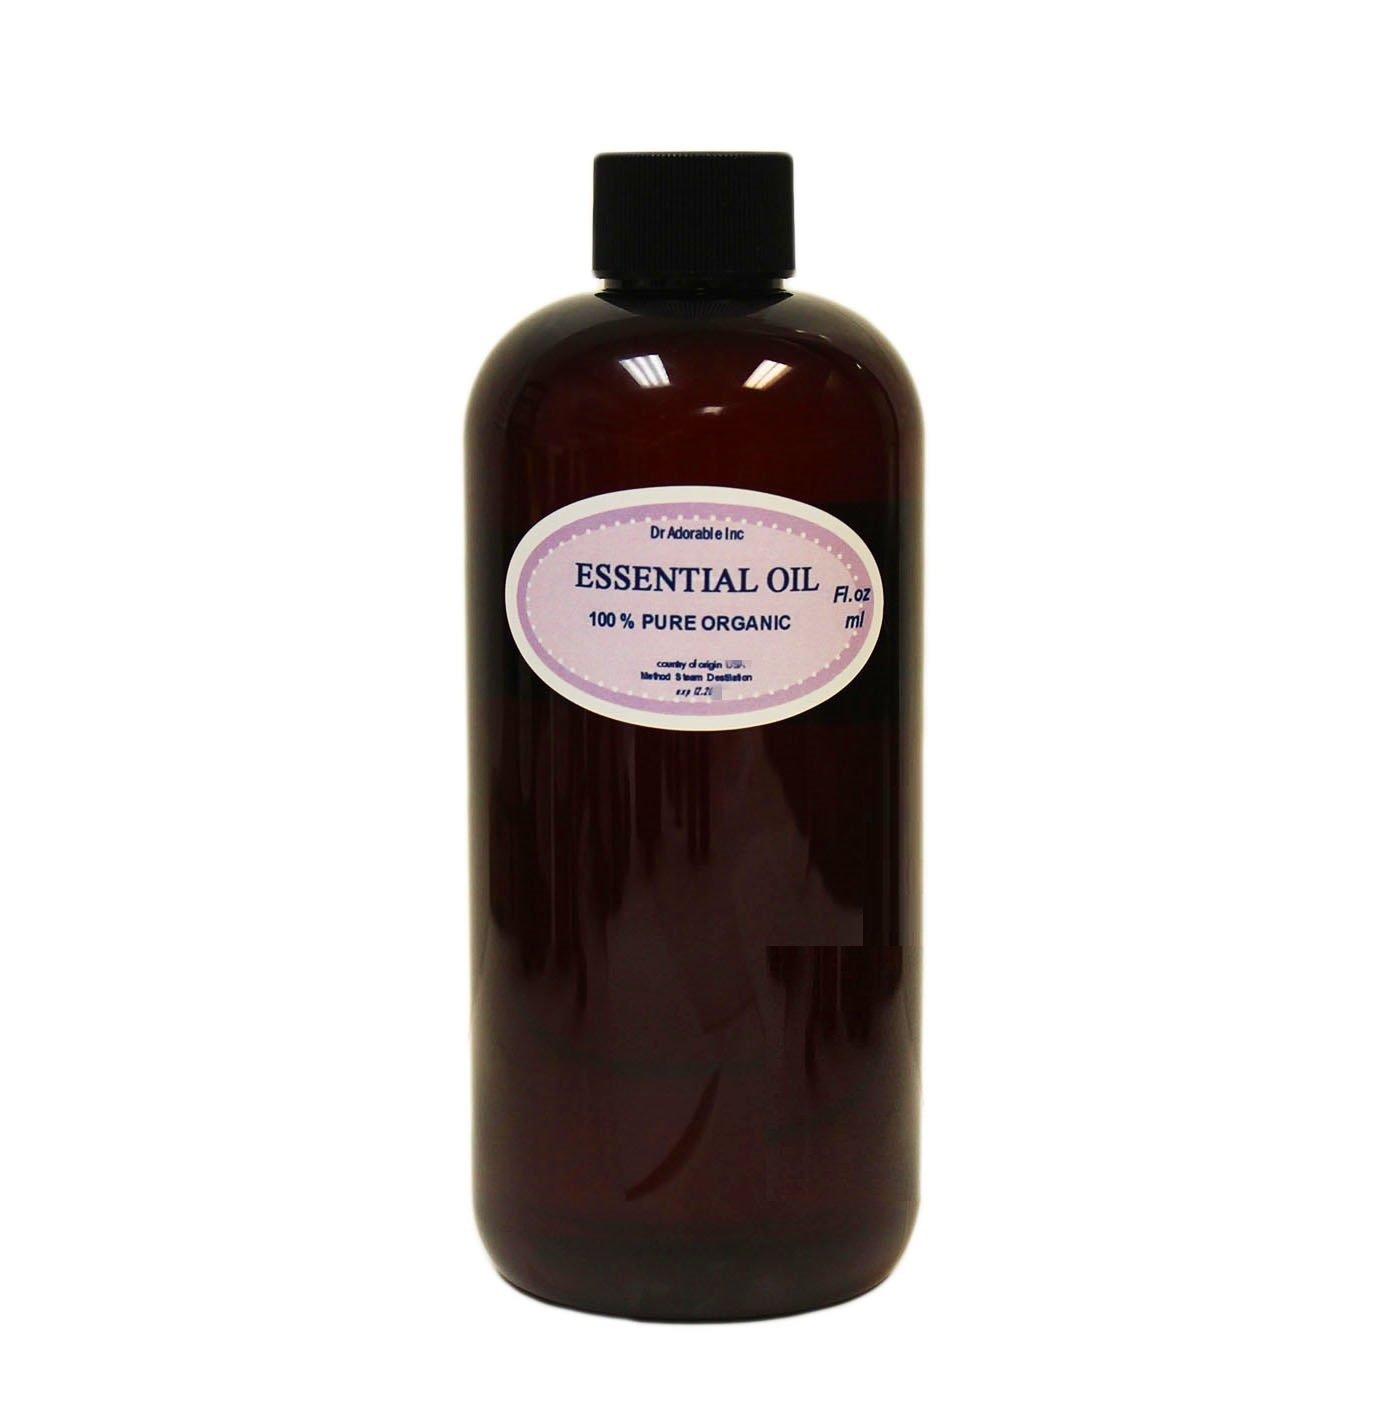 Rosemary Essential Oil 100% Pure Organic 16 Oz